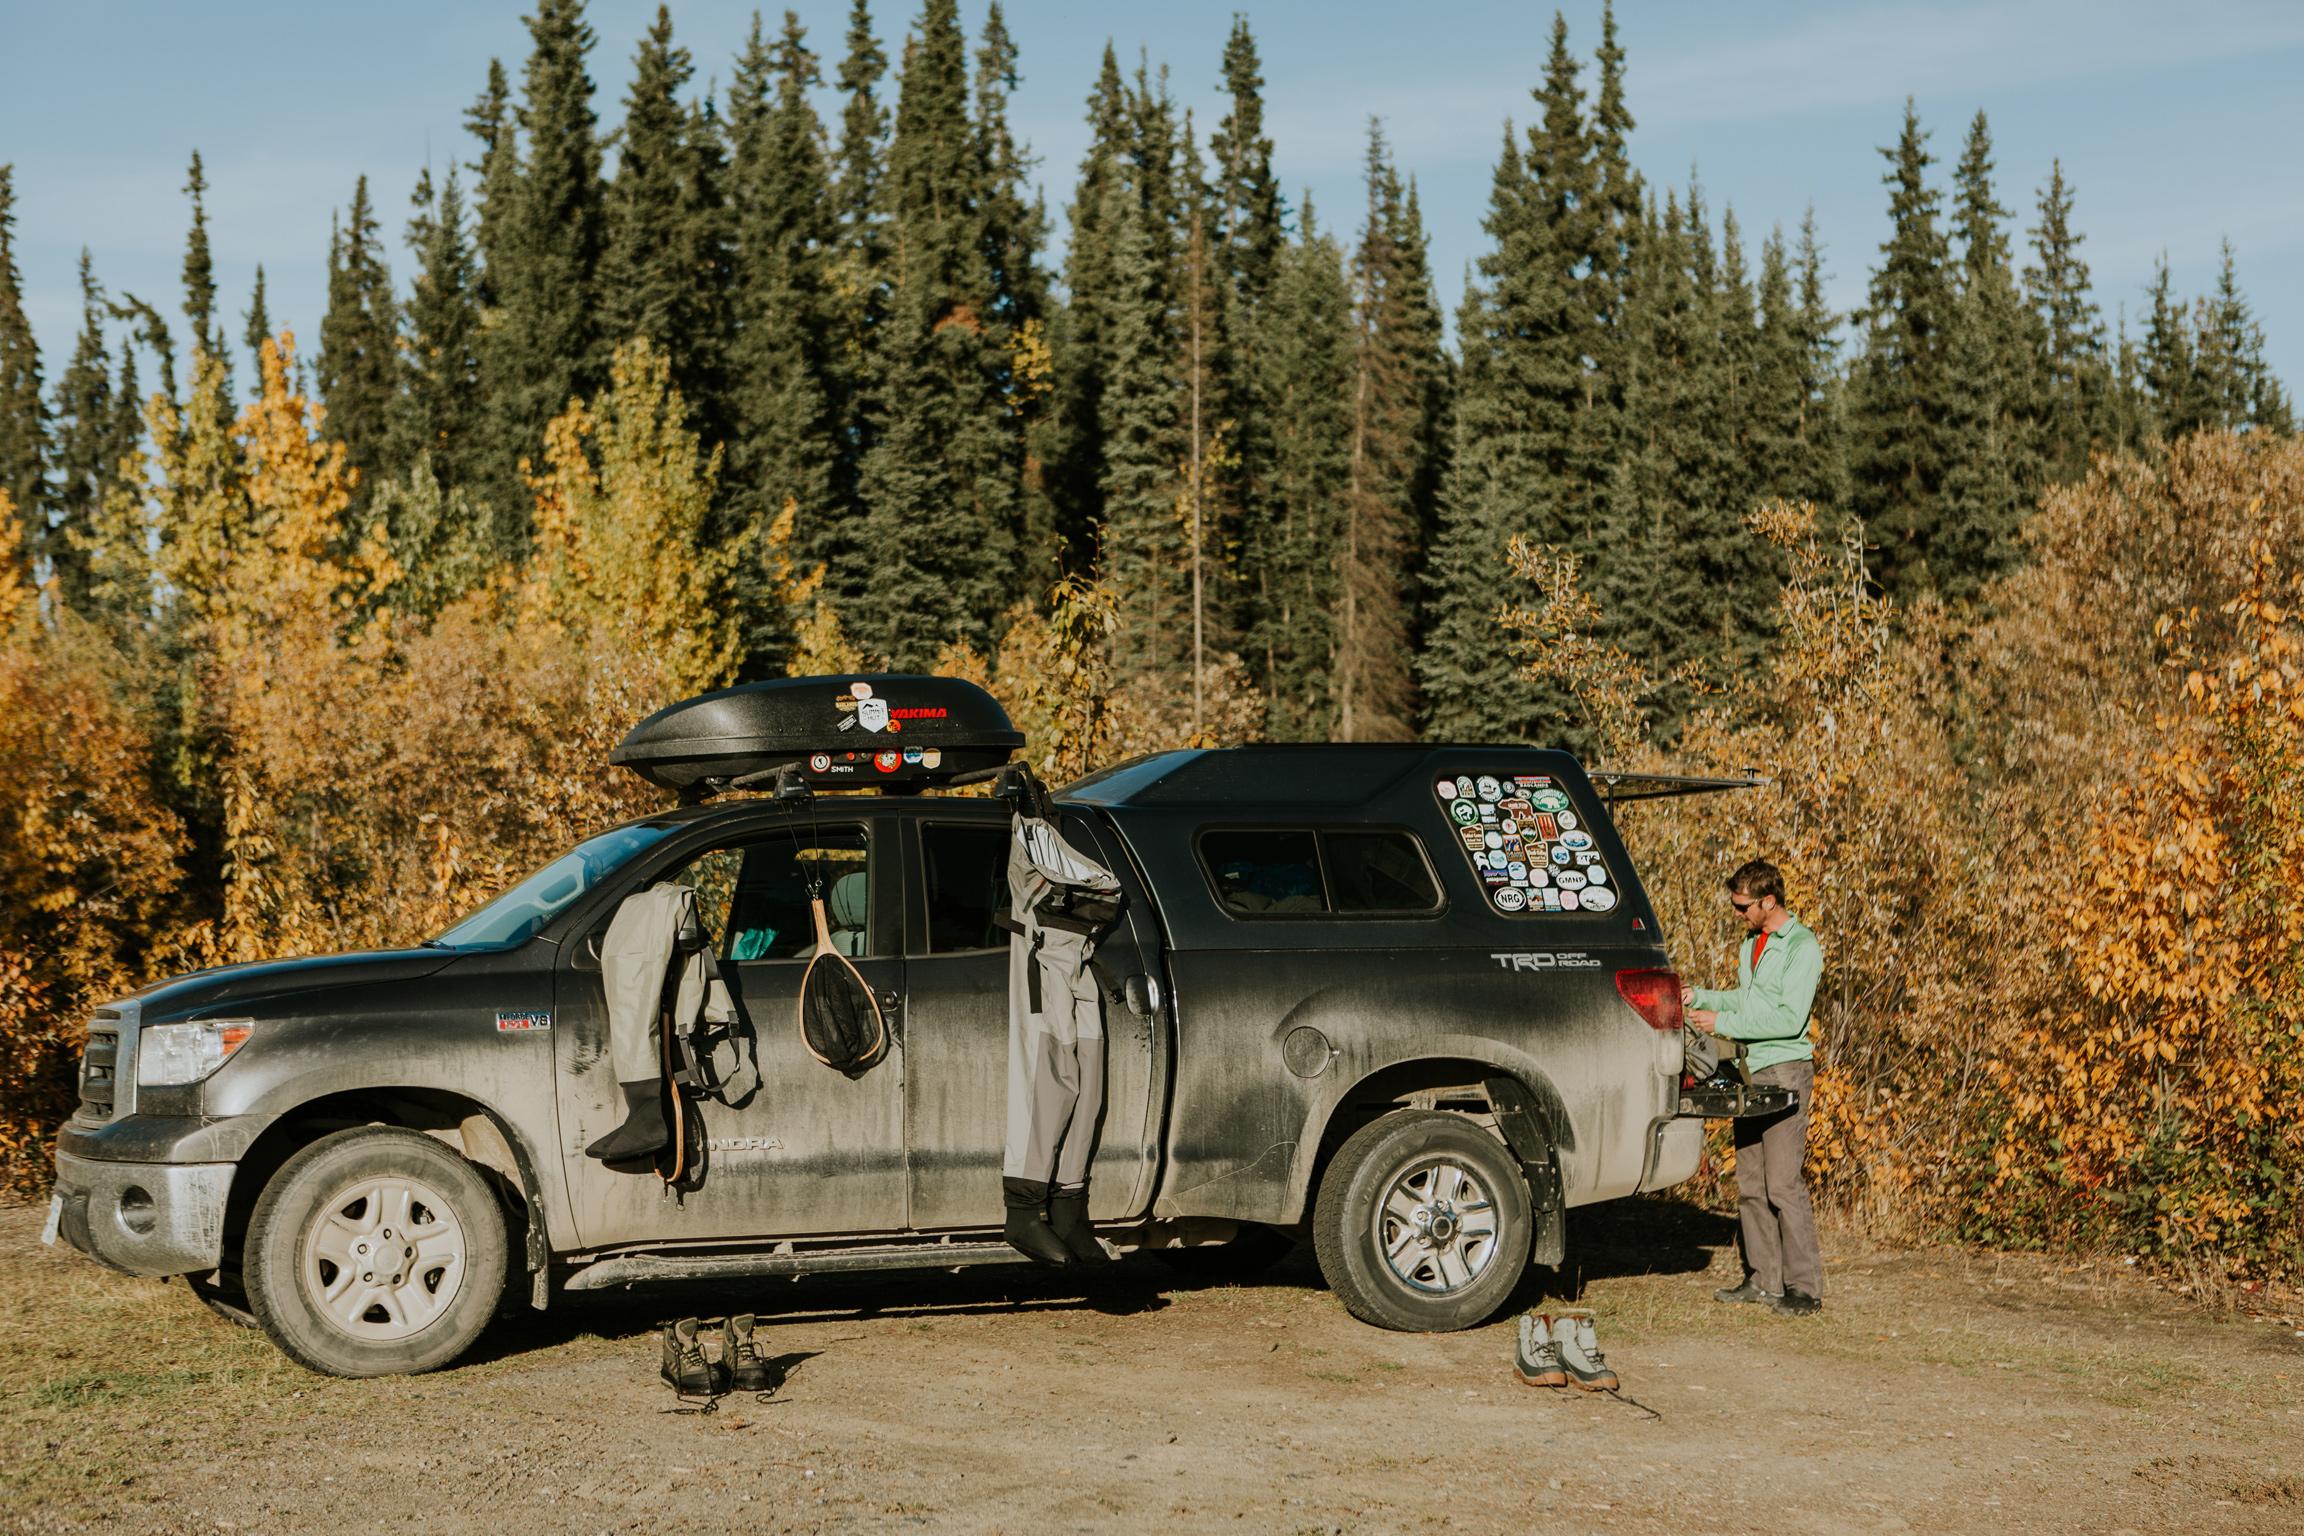 CindyGiovagnoli_Alaska_KoyukukRiver_SukakpakMountain_JimRiver_ArcticCircle_fly_fishing_September-070.jpg